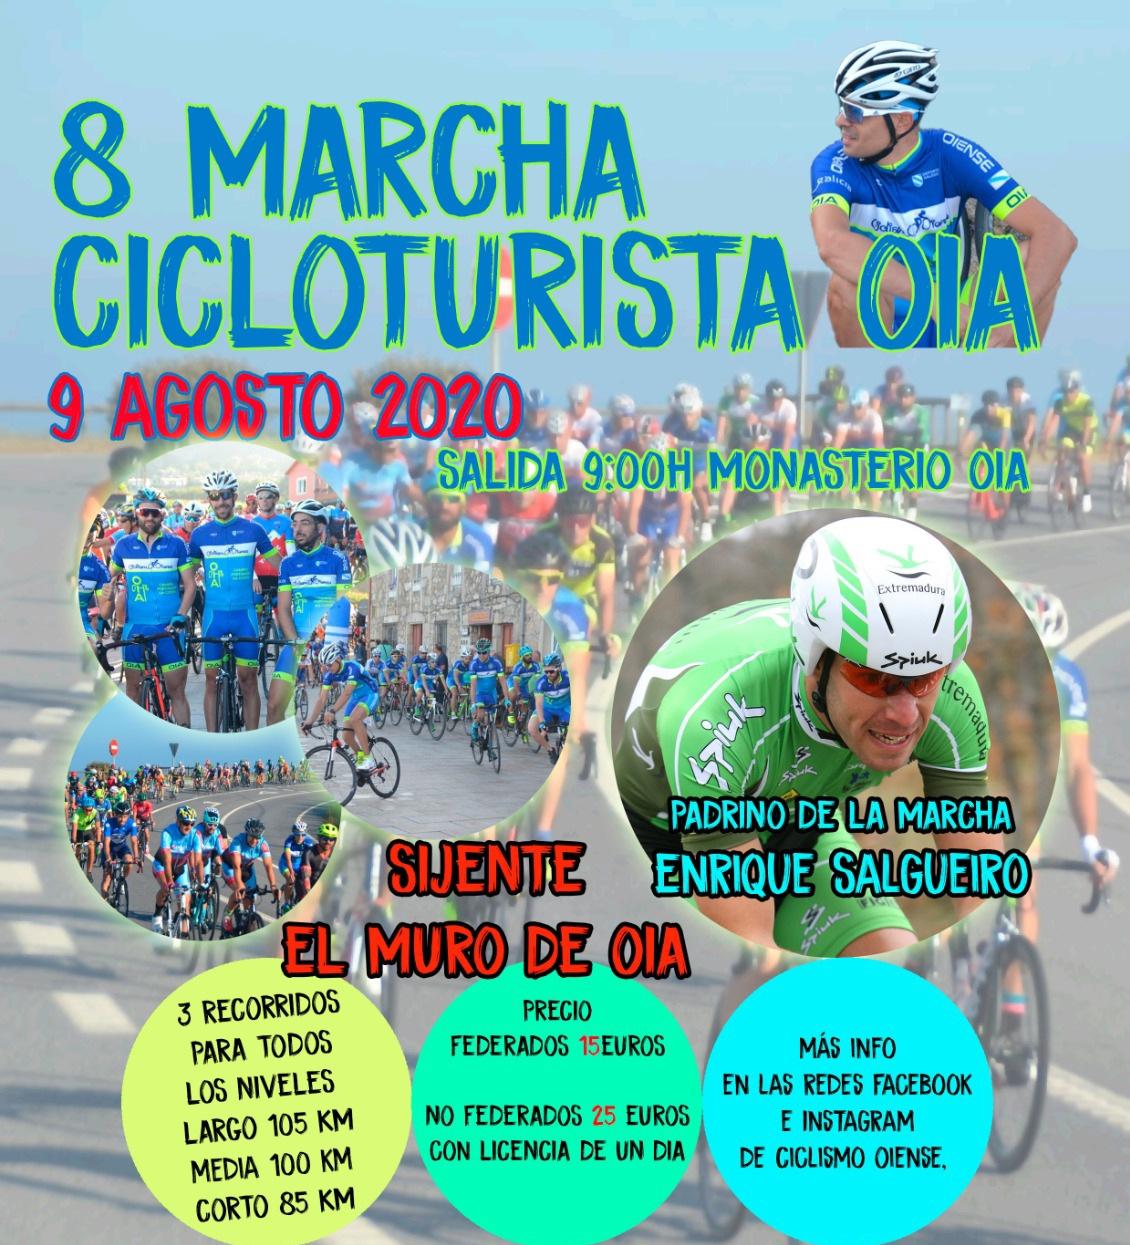 Cartel del evento 8 MARCHA CICLOTURISTA OIA